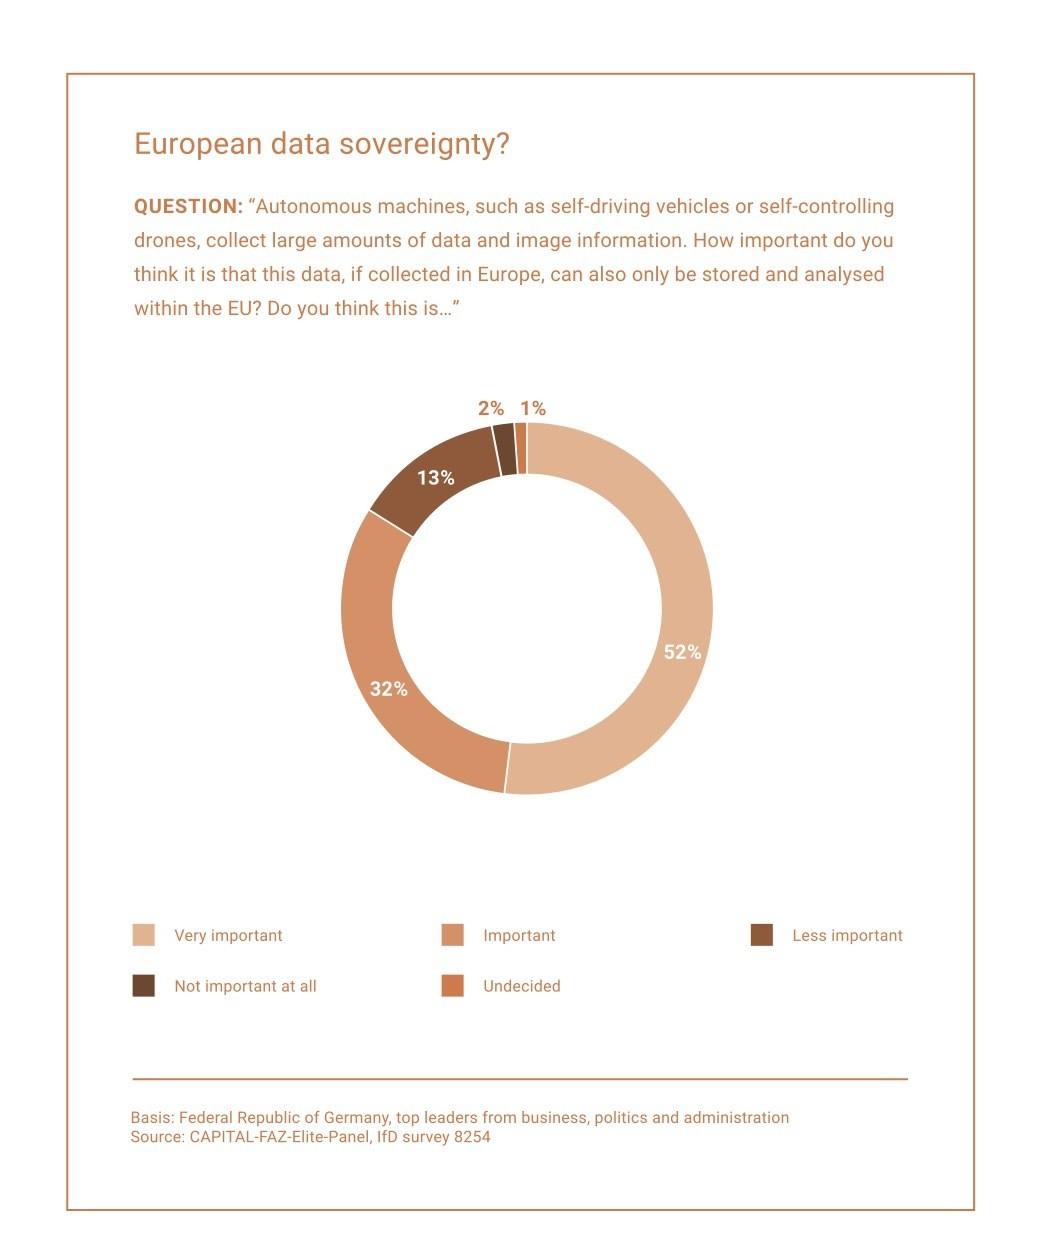 Figure 1: Autonomous machines and data sovereignty